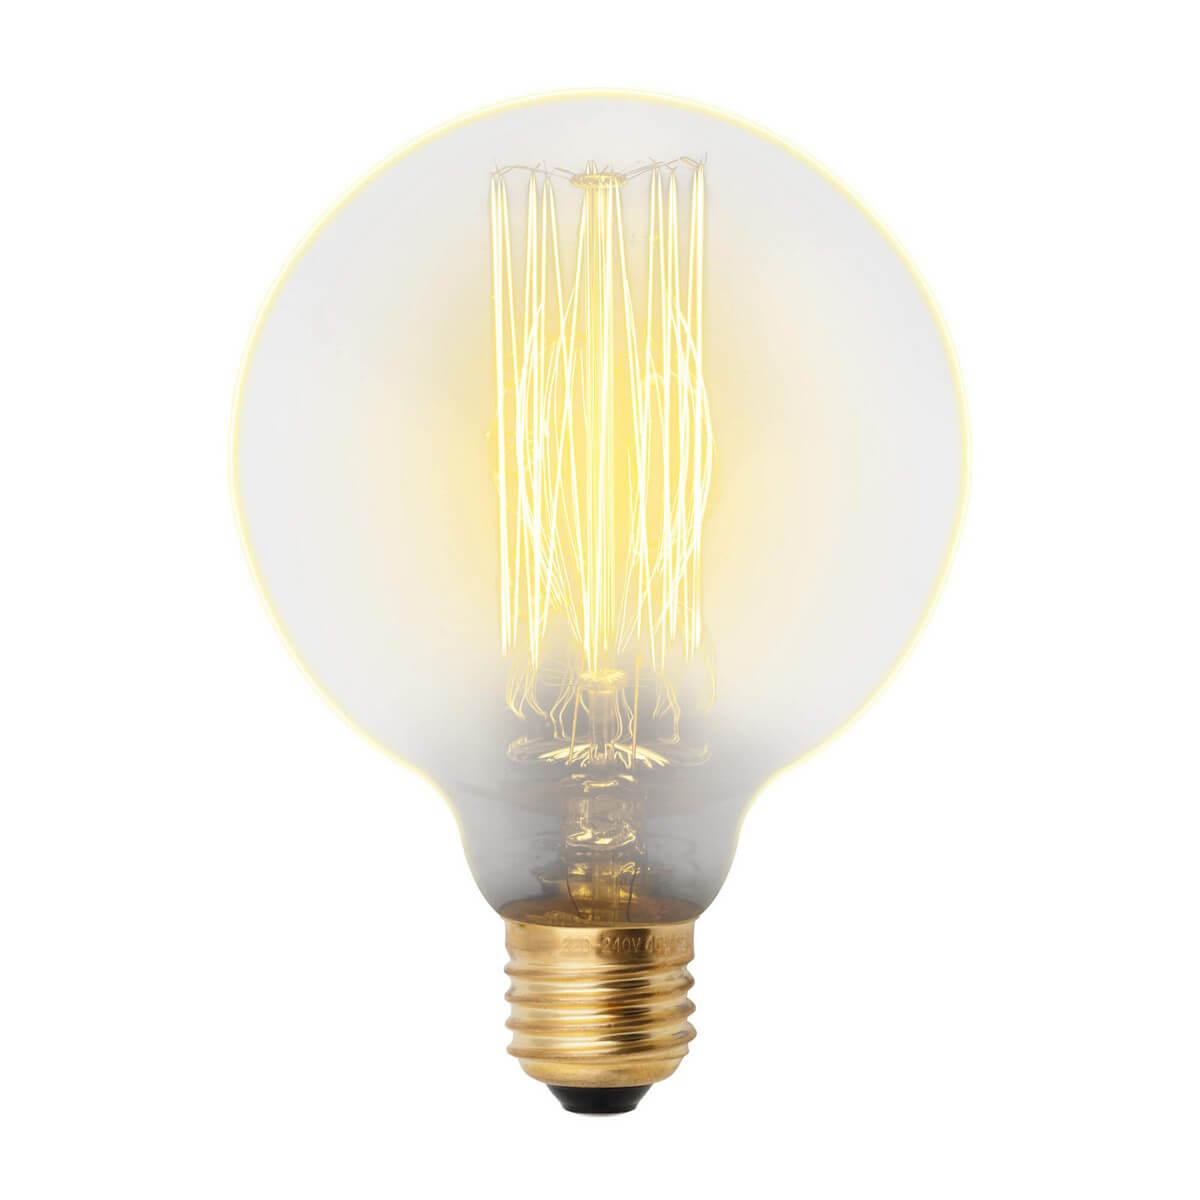 Лампочка Uniel IL-V-G95-60/GOLDEN/E27 VW01 Vintage